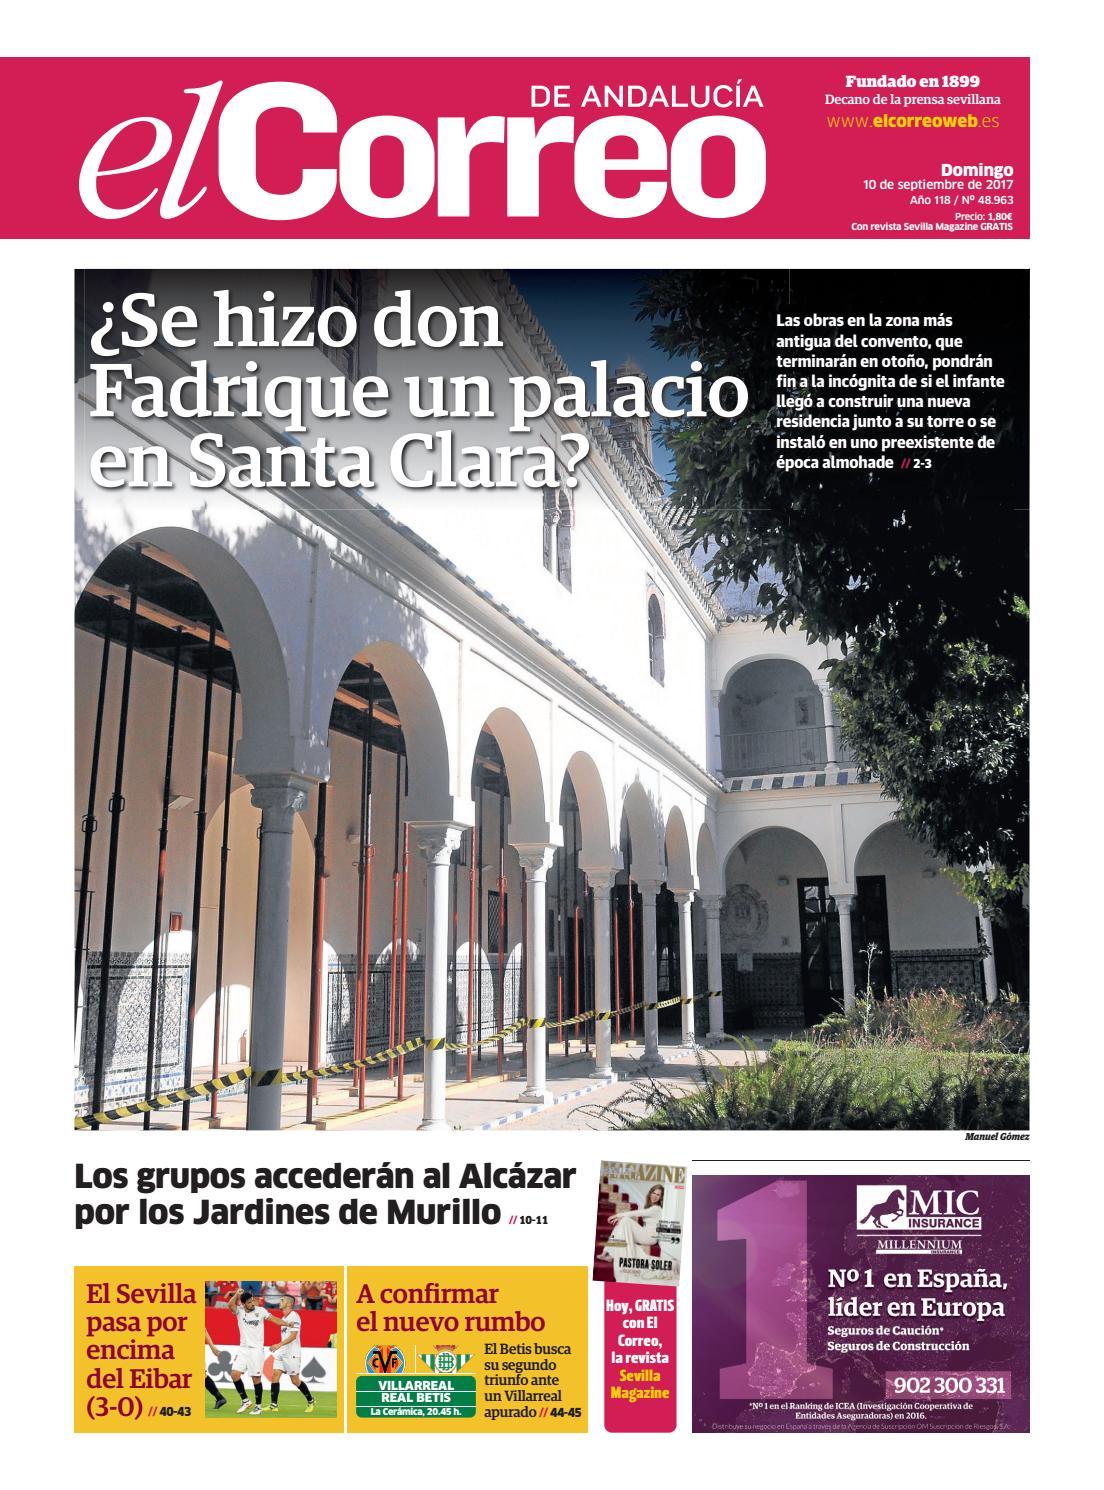 El S lIssuu 10 Correo De Andalucía 2017 By 09 Yb7vfy6Igm